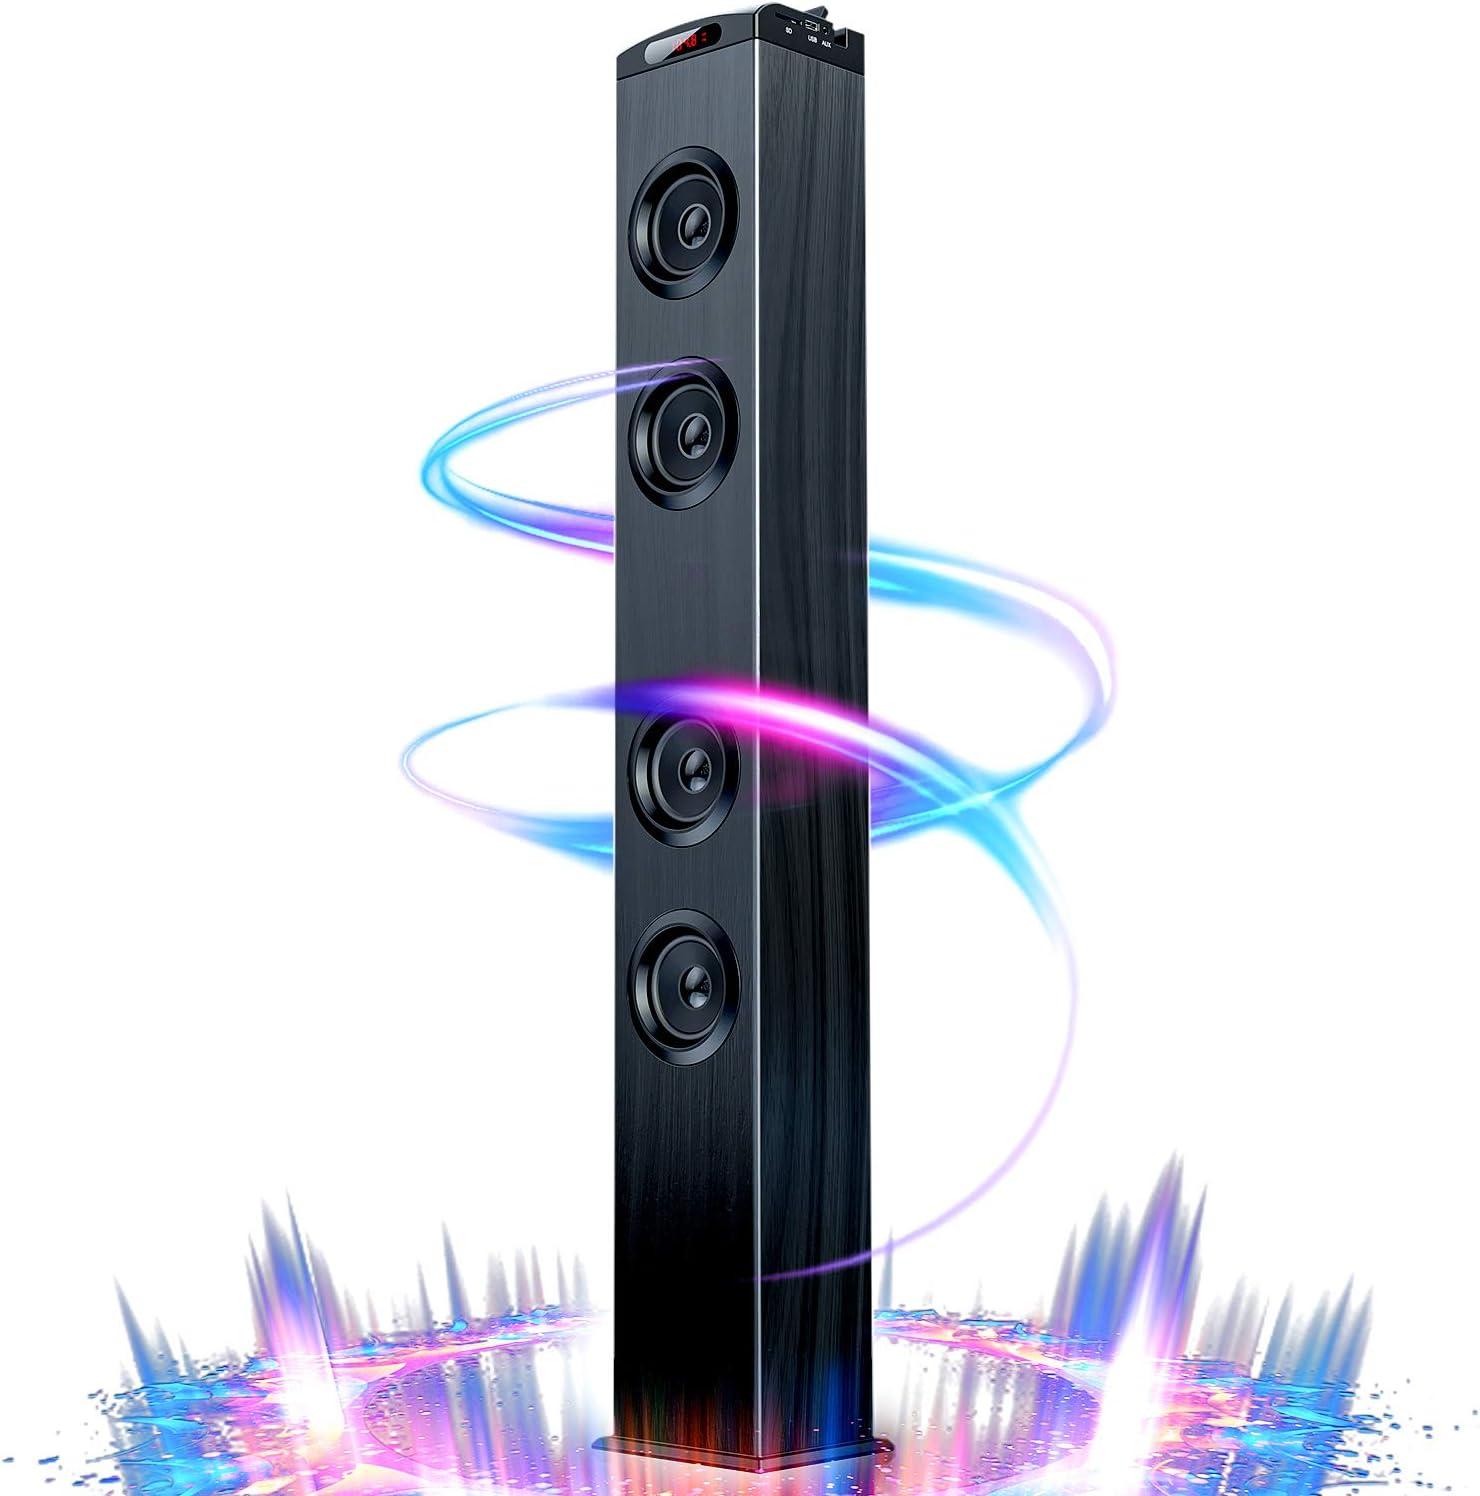 Floor Standing Bluetooth Tower Speaker, Floor Speakers for Home Stereo  System, Floor Standing Speakers Home Theater, VENLOIC Bluetooth Tower  Speakers